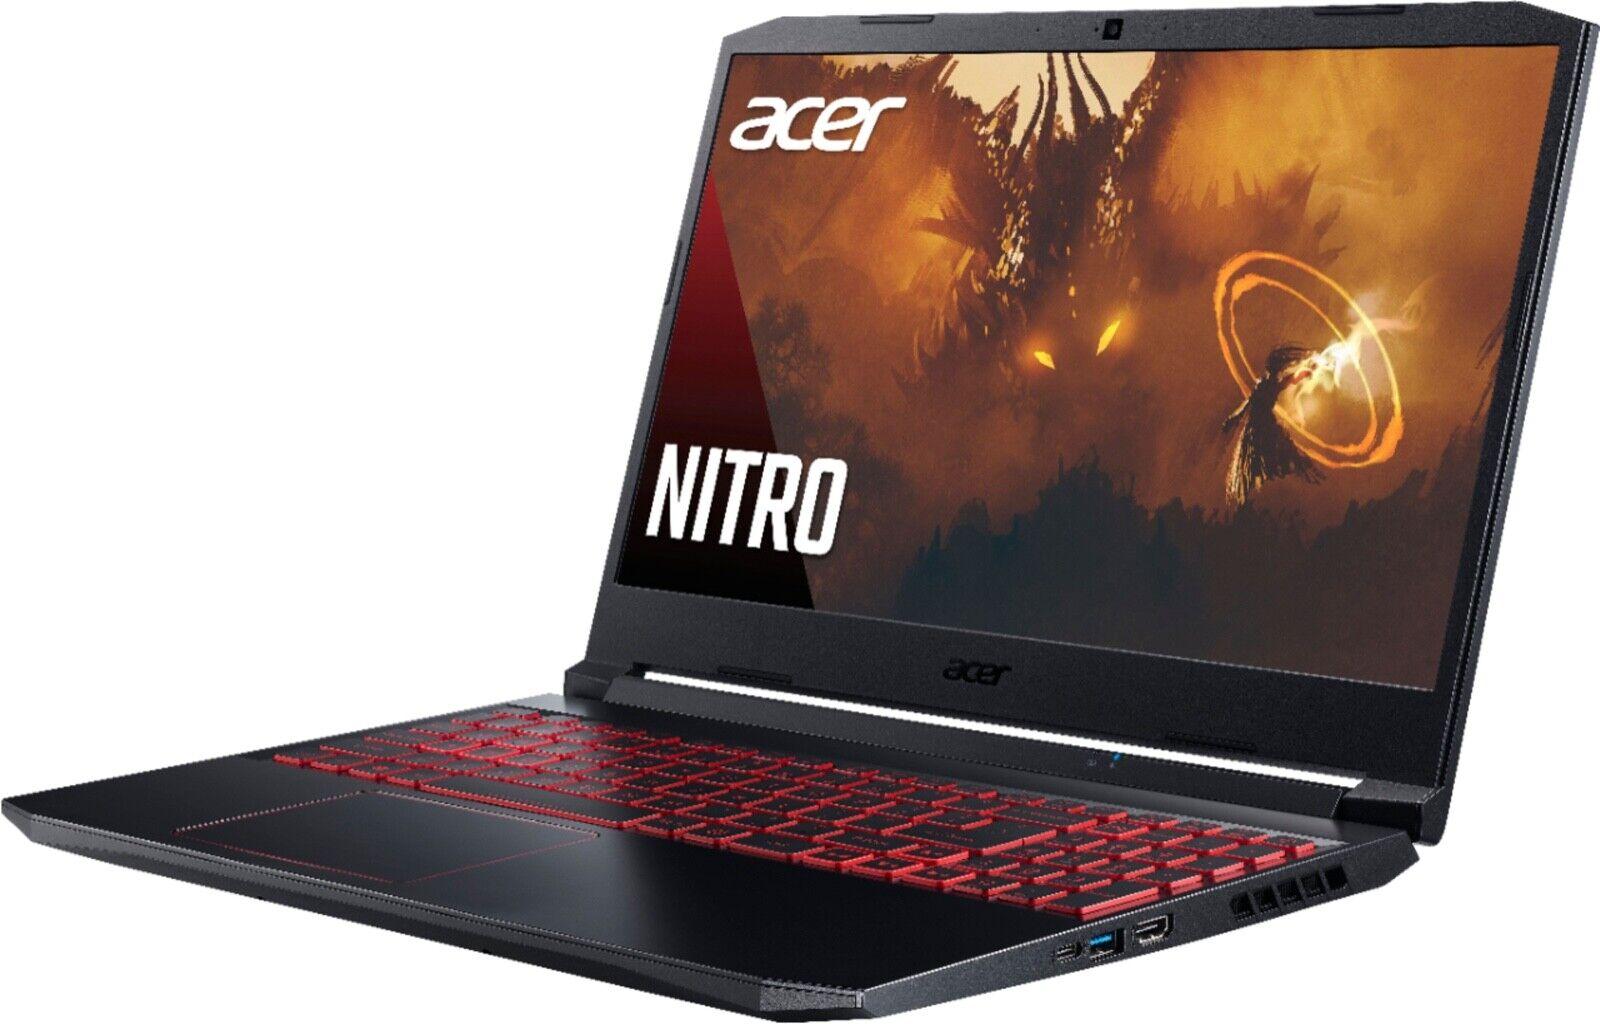 2020 Acer Nitro 5 15.6'' FHD Gaming Laptop AMD Ryzen 5 GTX 1650,32GB RAM&1TB SSD 1